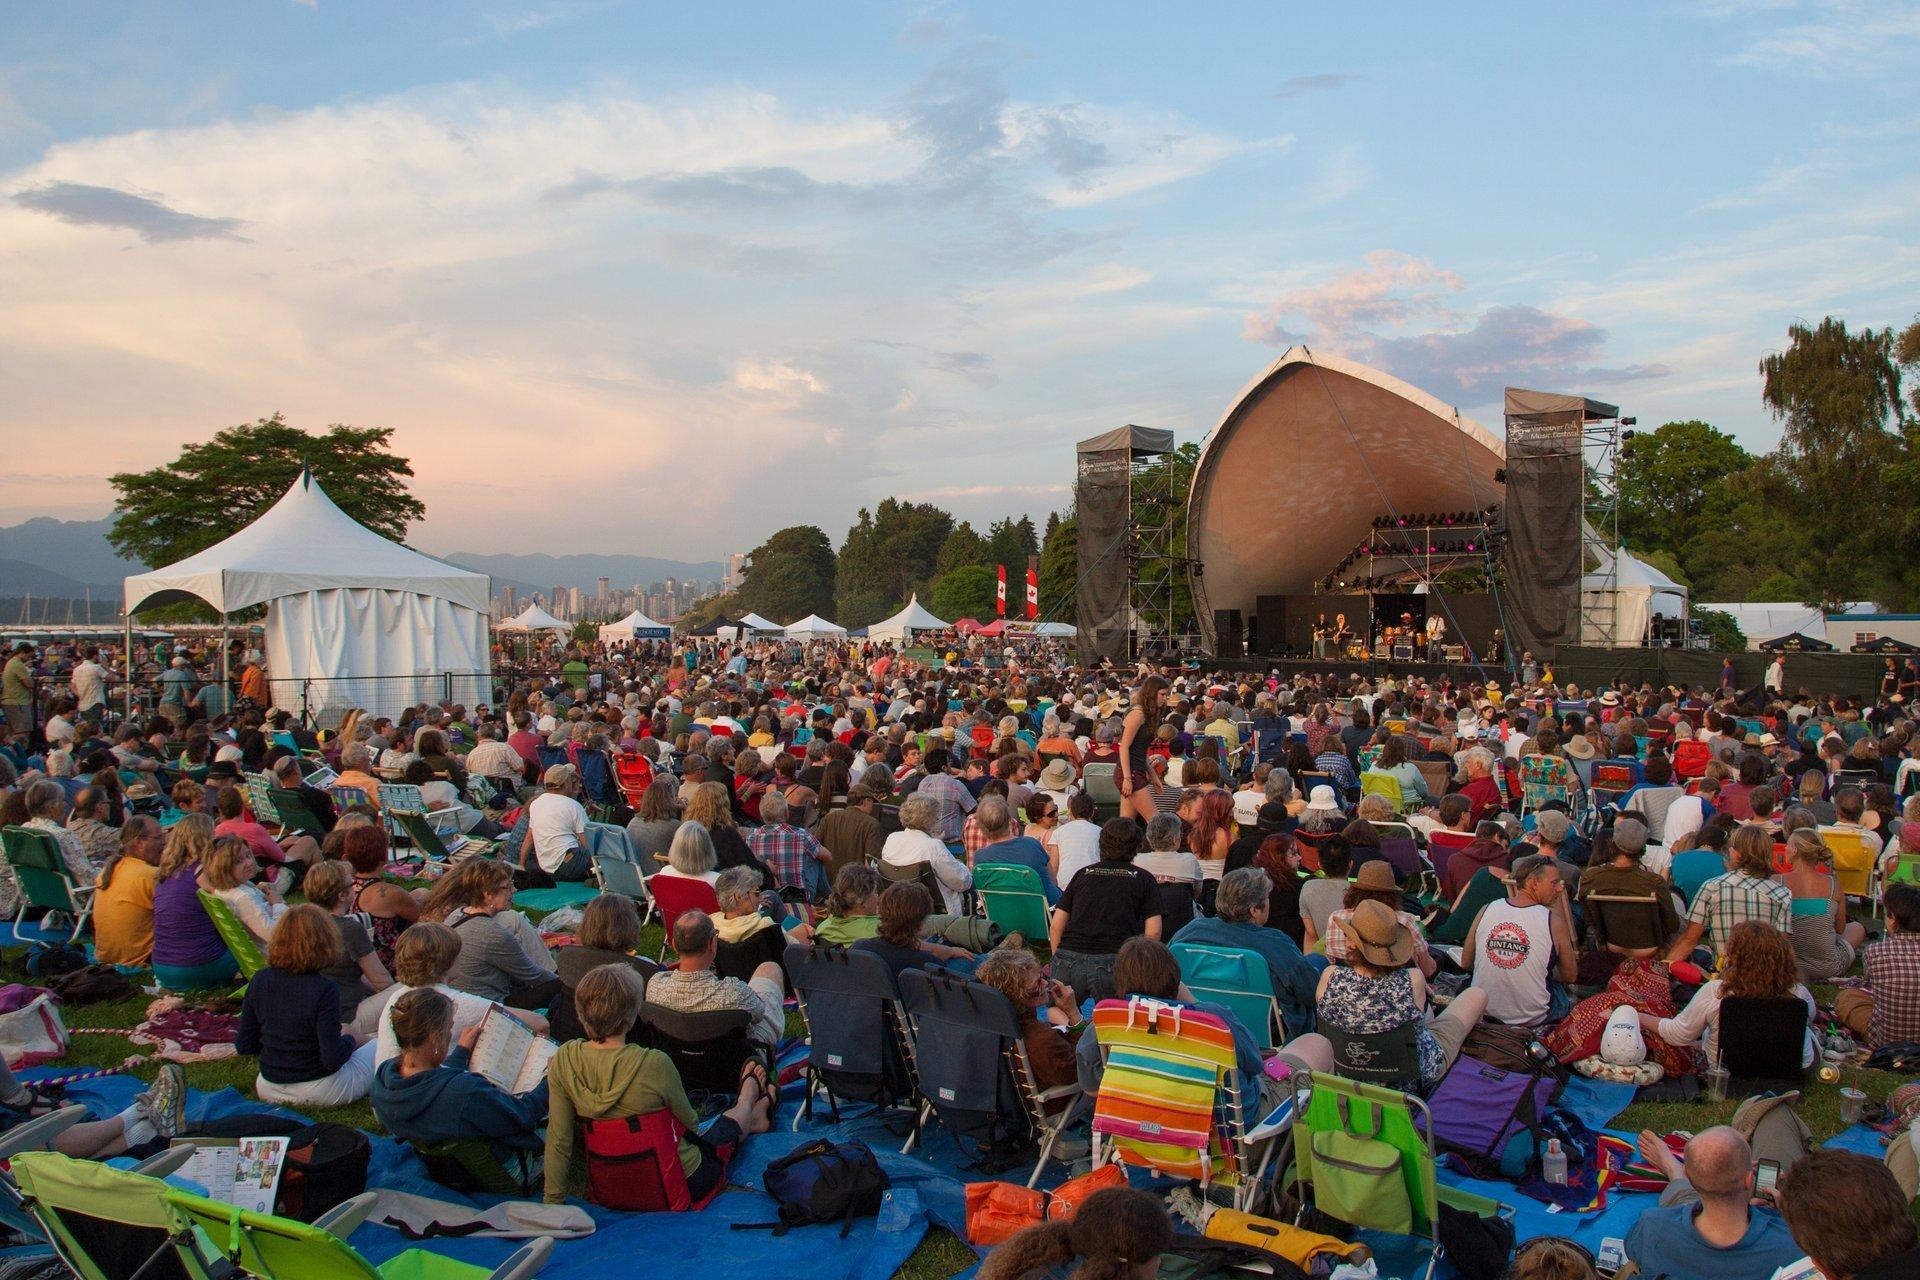 Best time for Vancouver Folk Music Festival